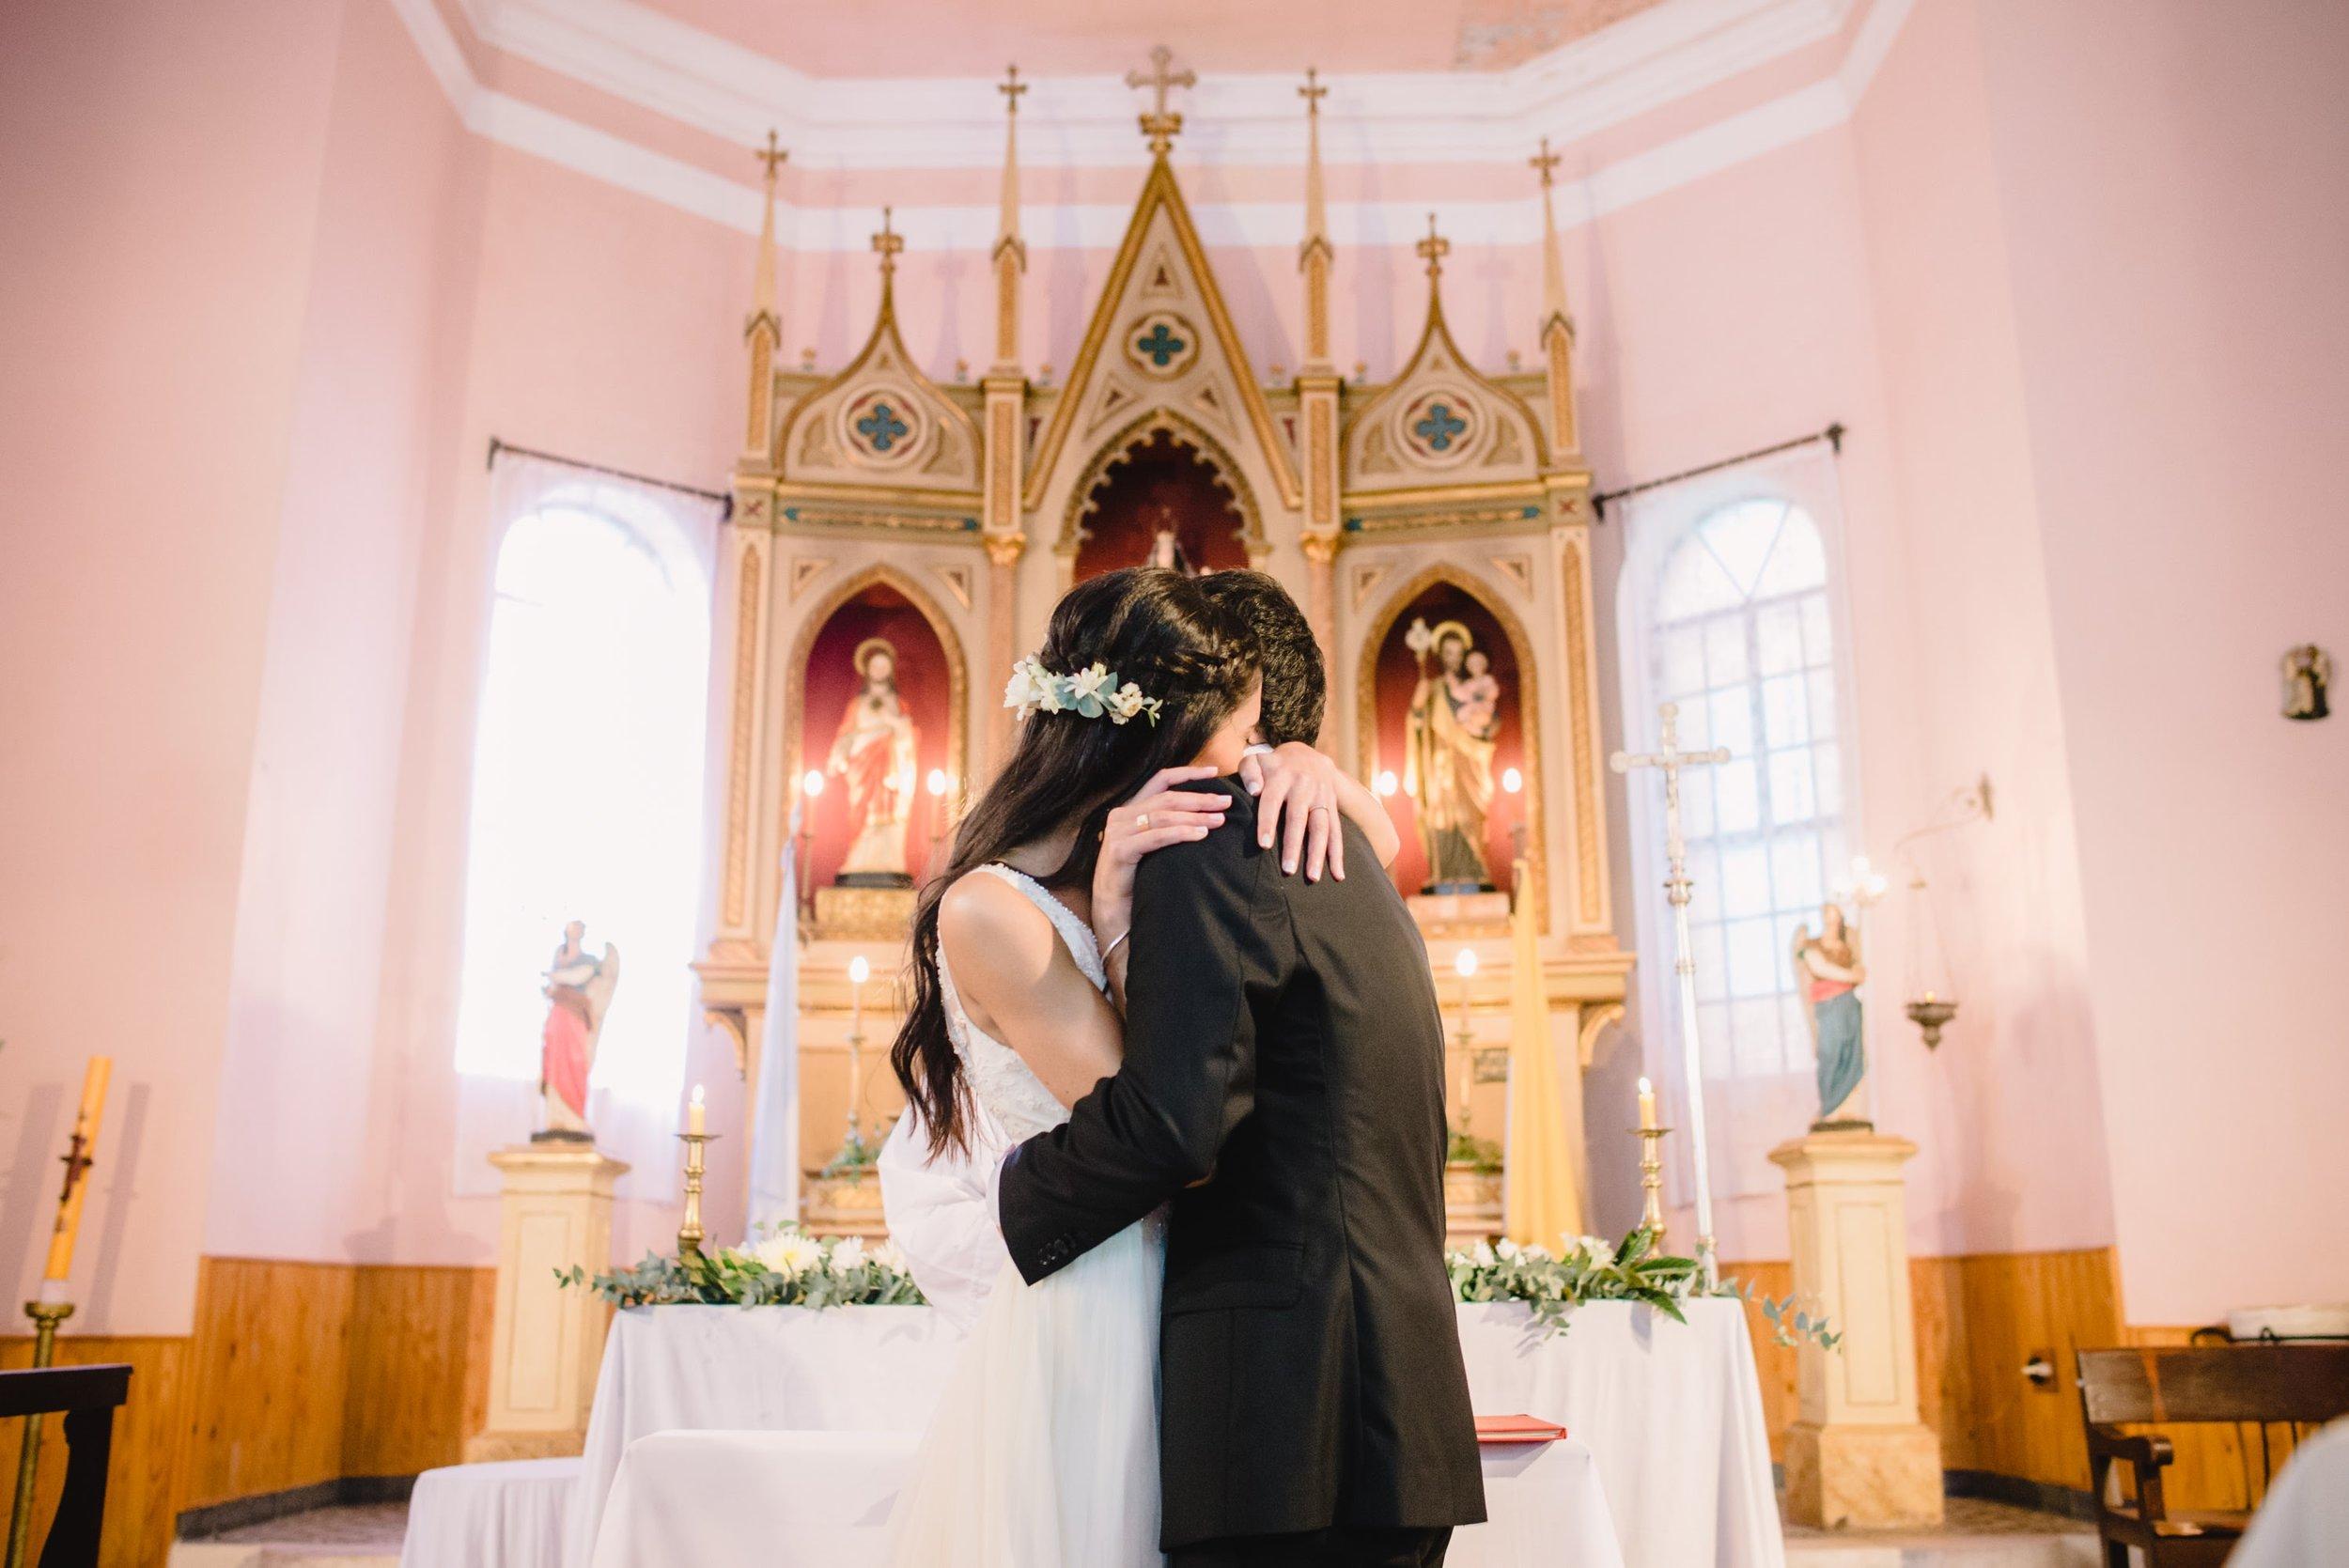 fotografo de bodas en carlos paz cordoba 029.JPG